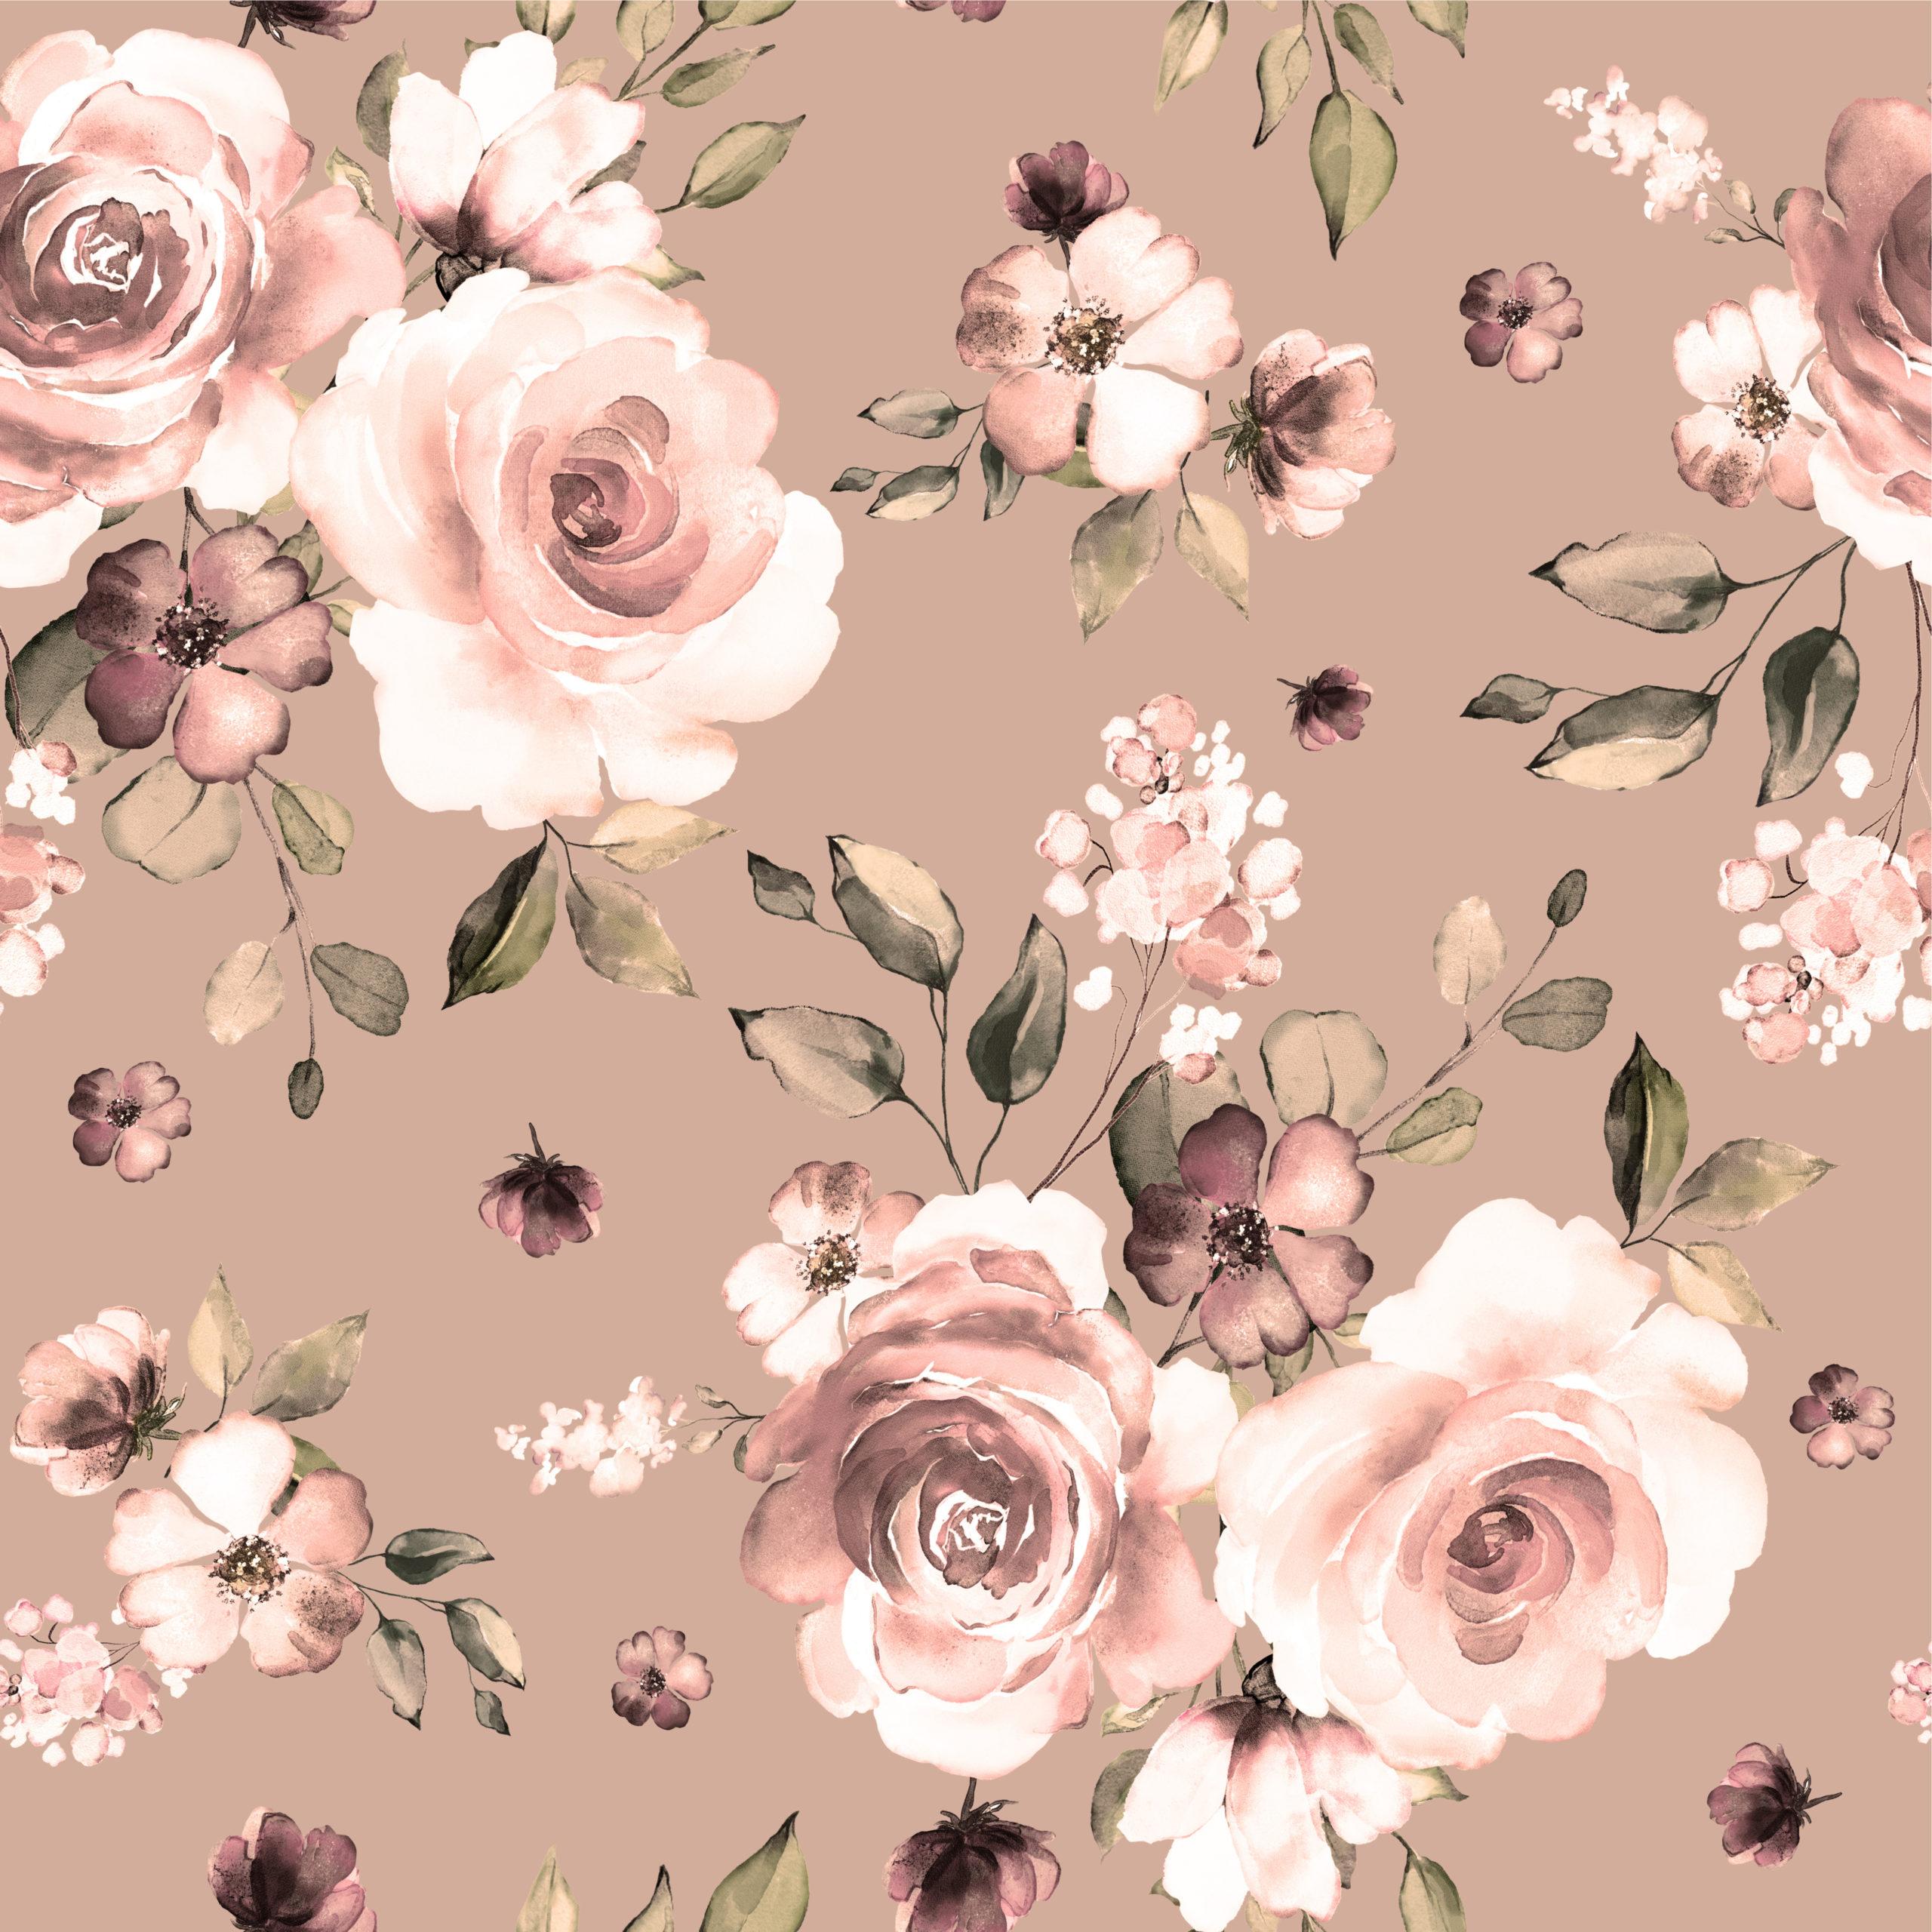 Nougat flowers